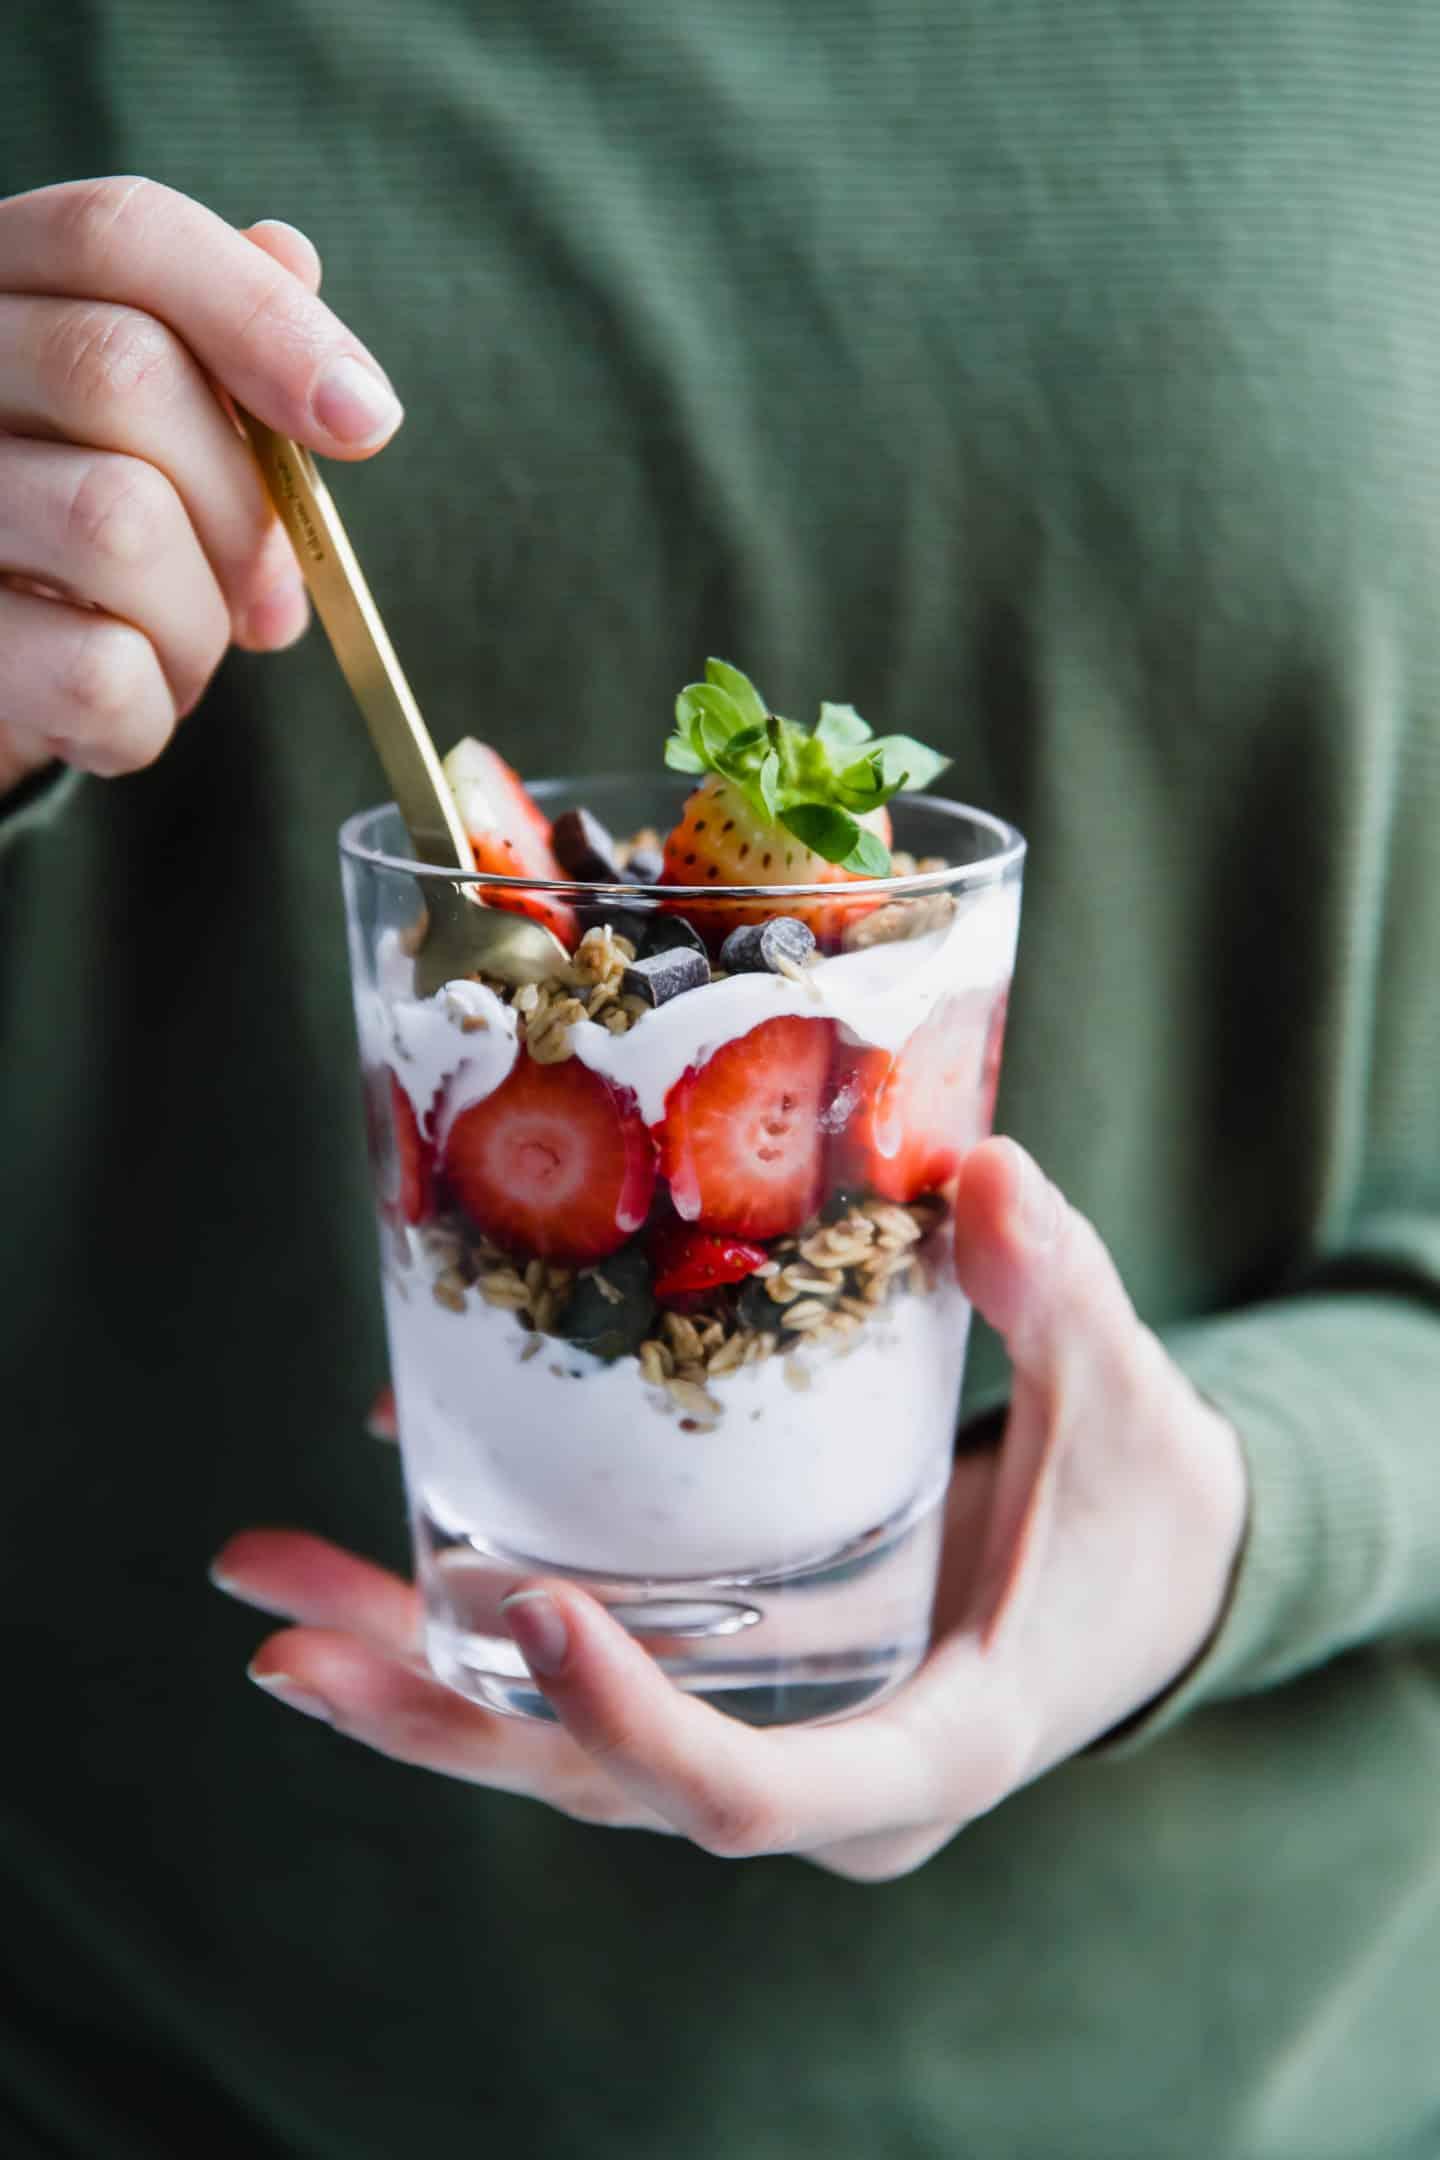 Breakfast parfait with layers of yogurt, granola, and strawberries